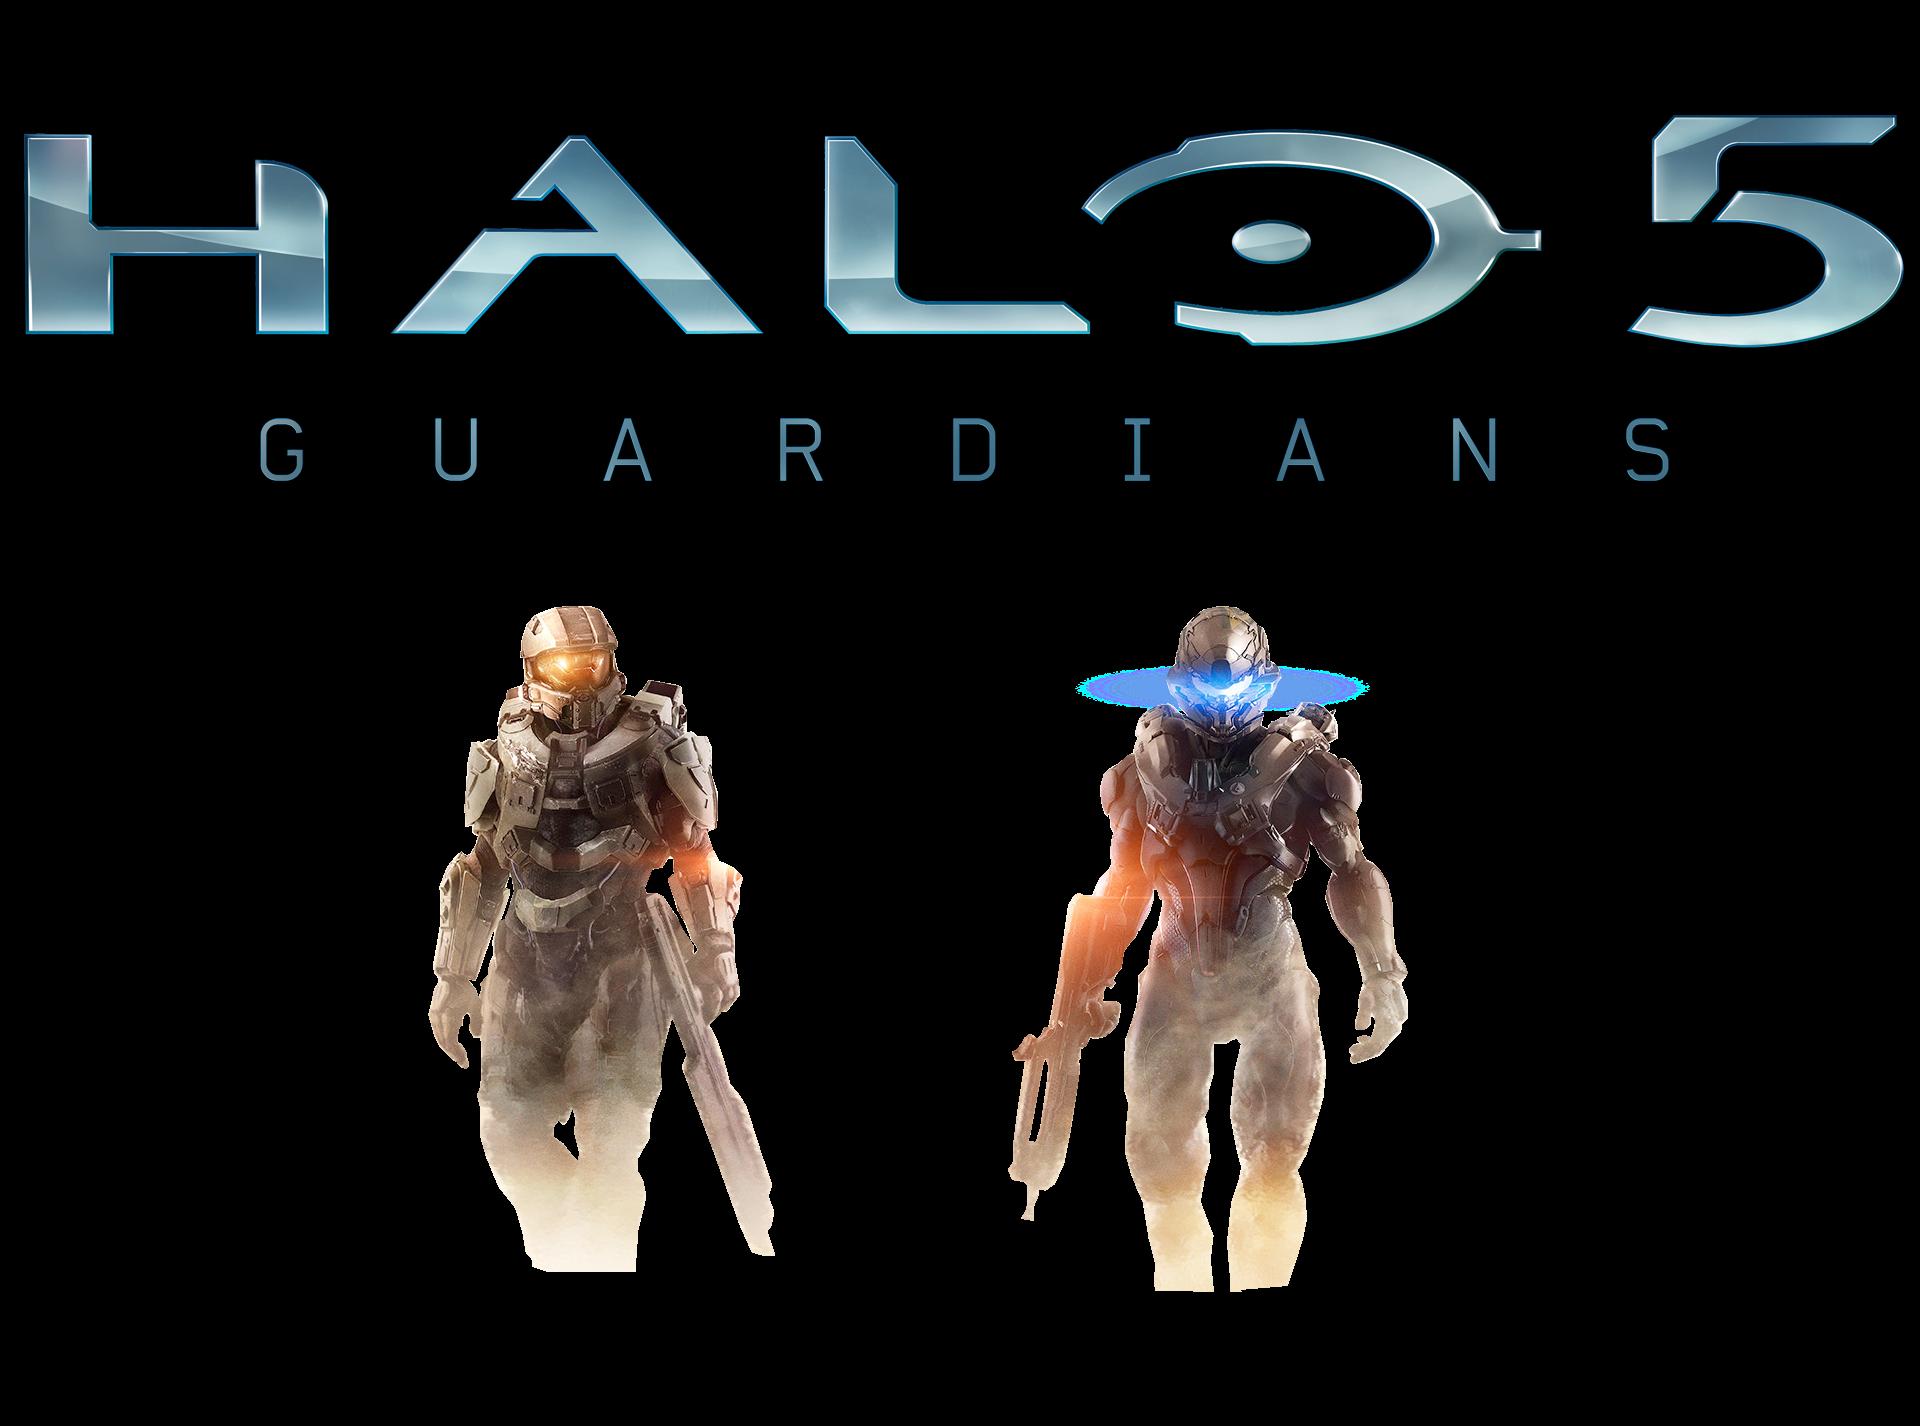 Halo 5 Guardians Logo Png (+).